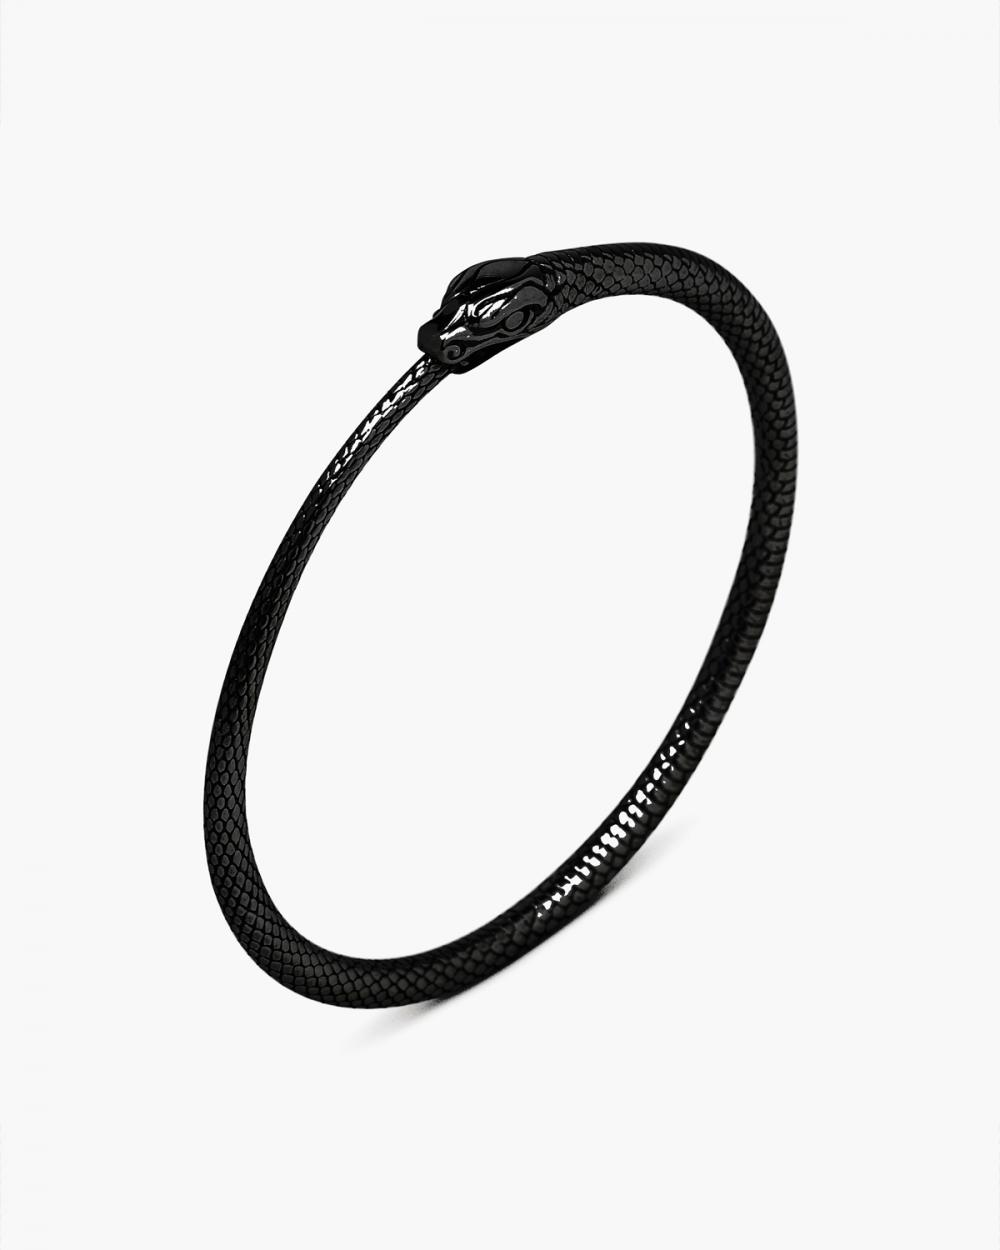 Bracelets RUTHENIUM OUROBOROS BRACELET NOVE25